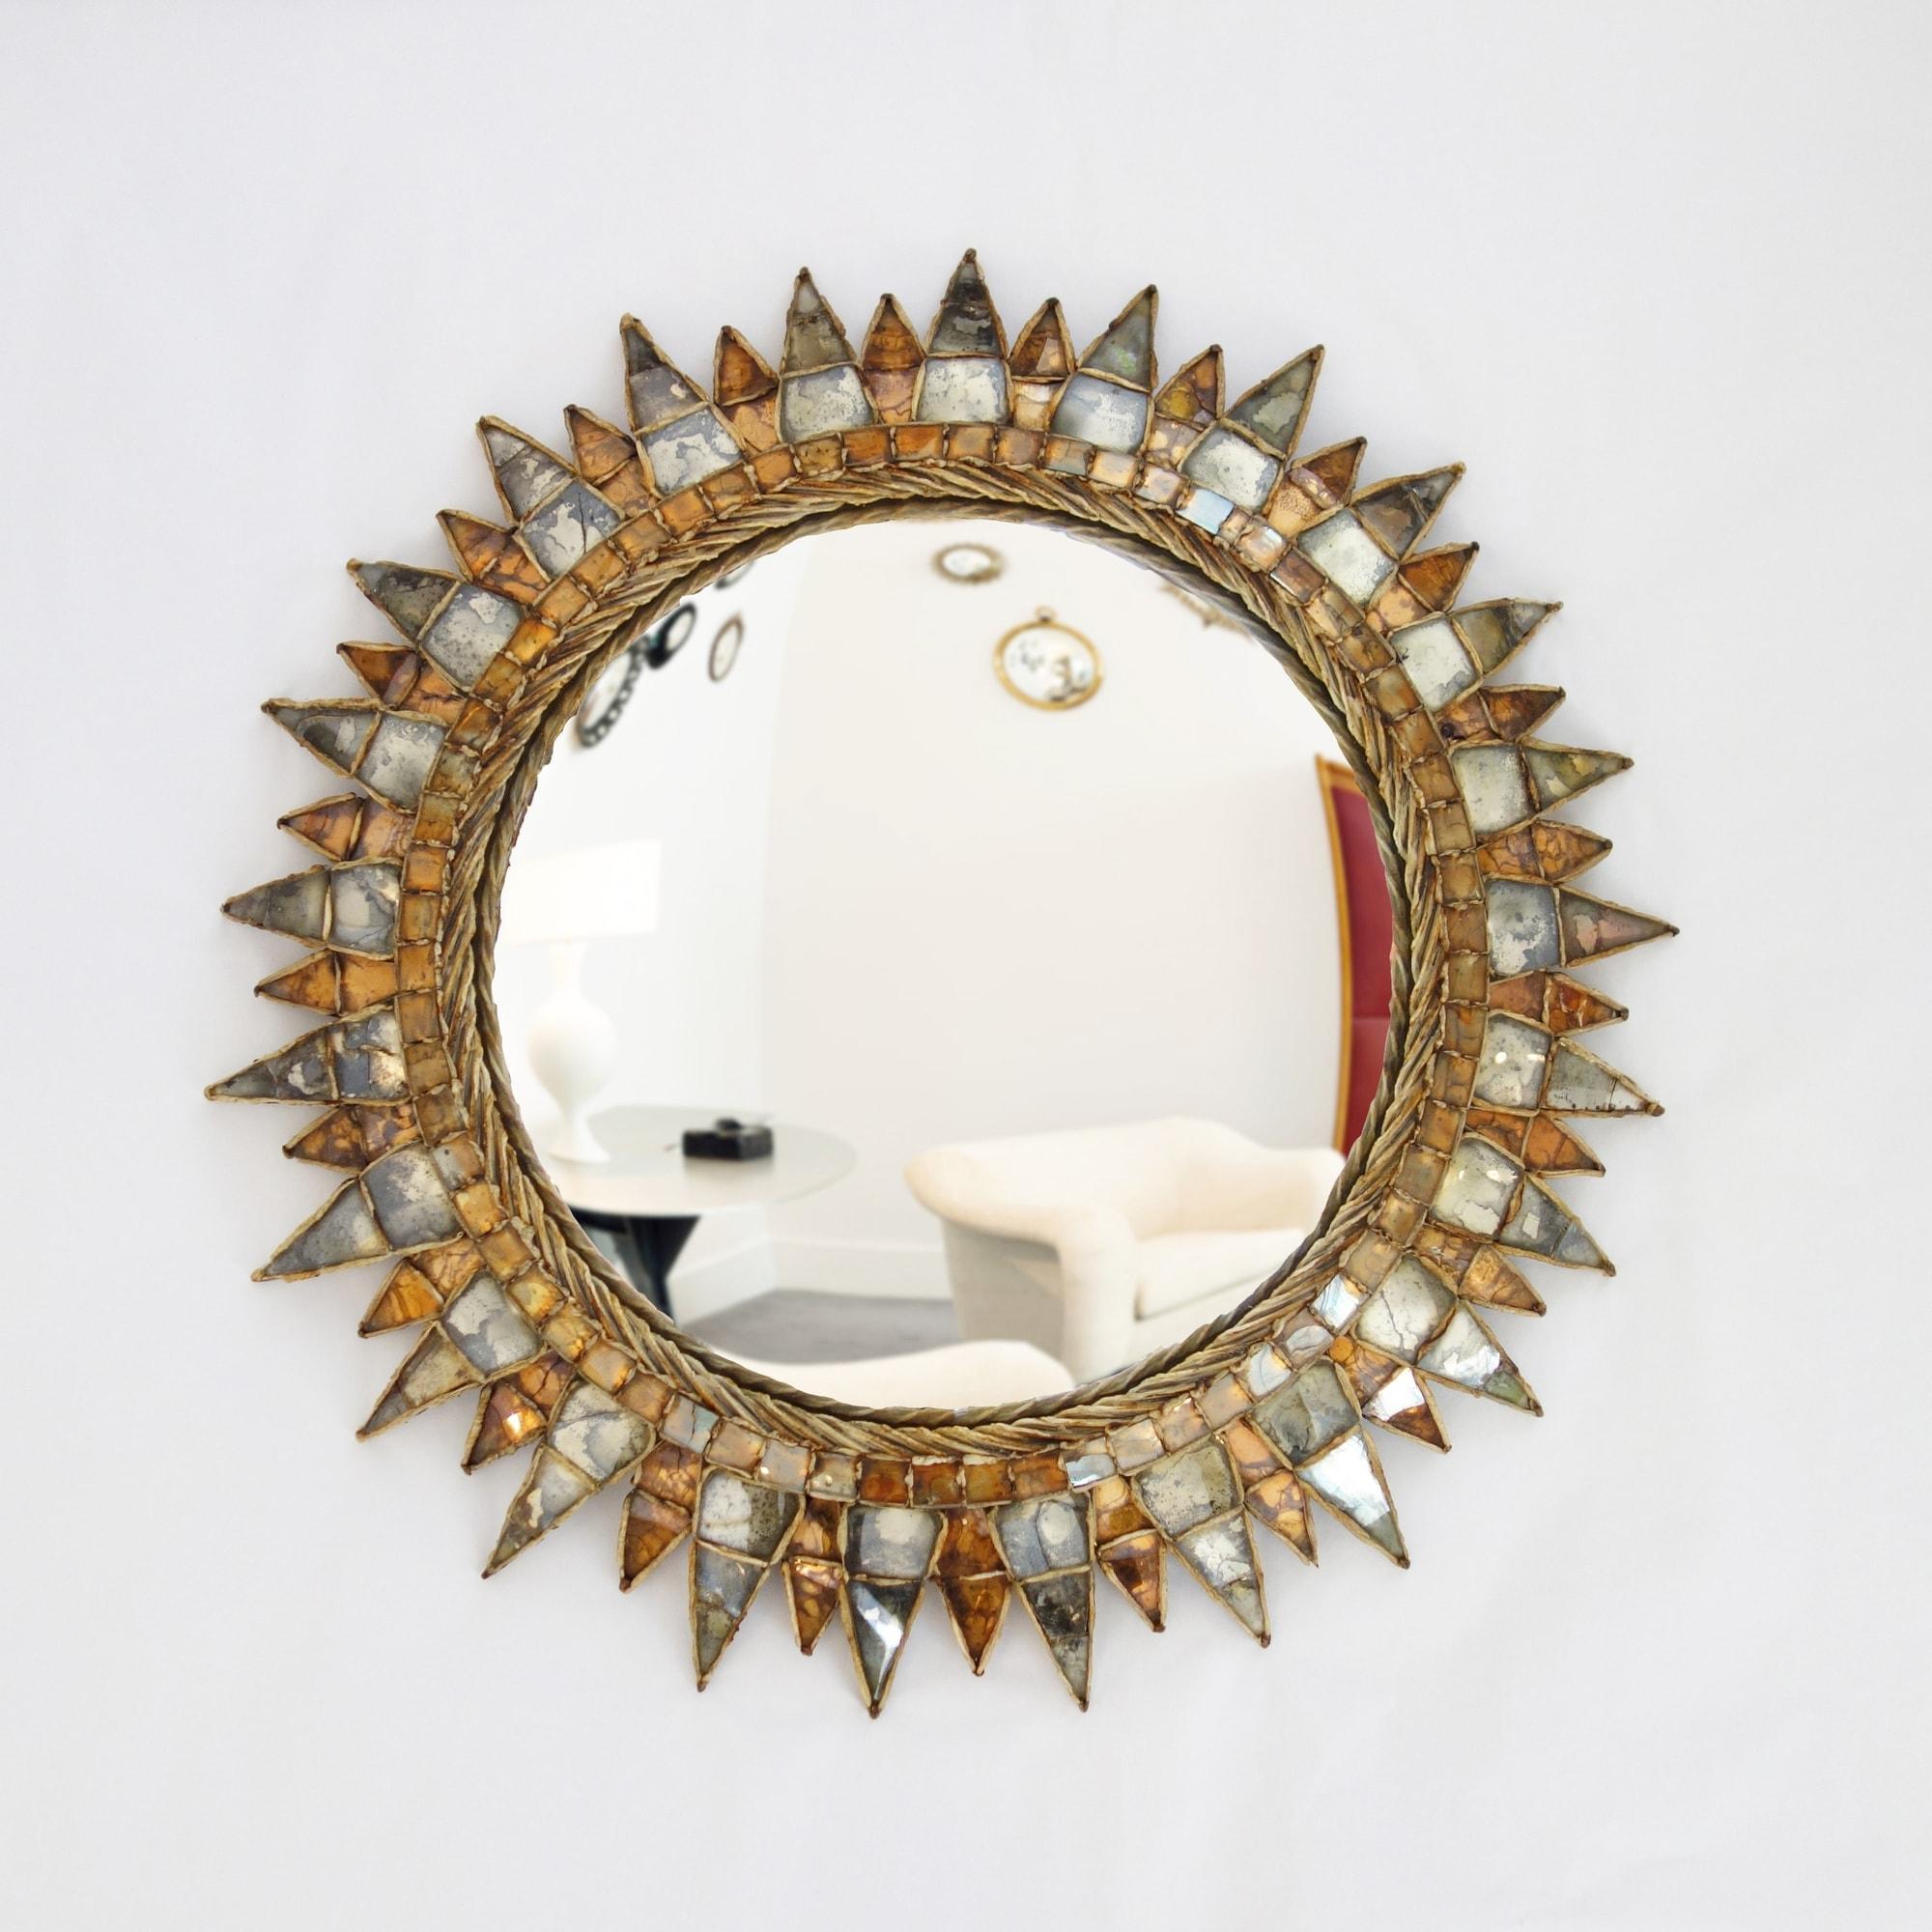 Line Vautrin, 'Soleil à pointes n°3' mirror, vue 01